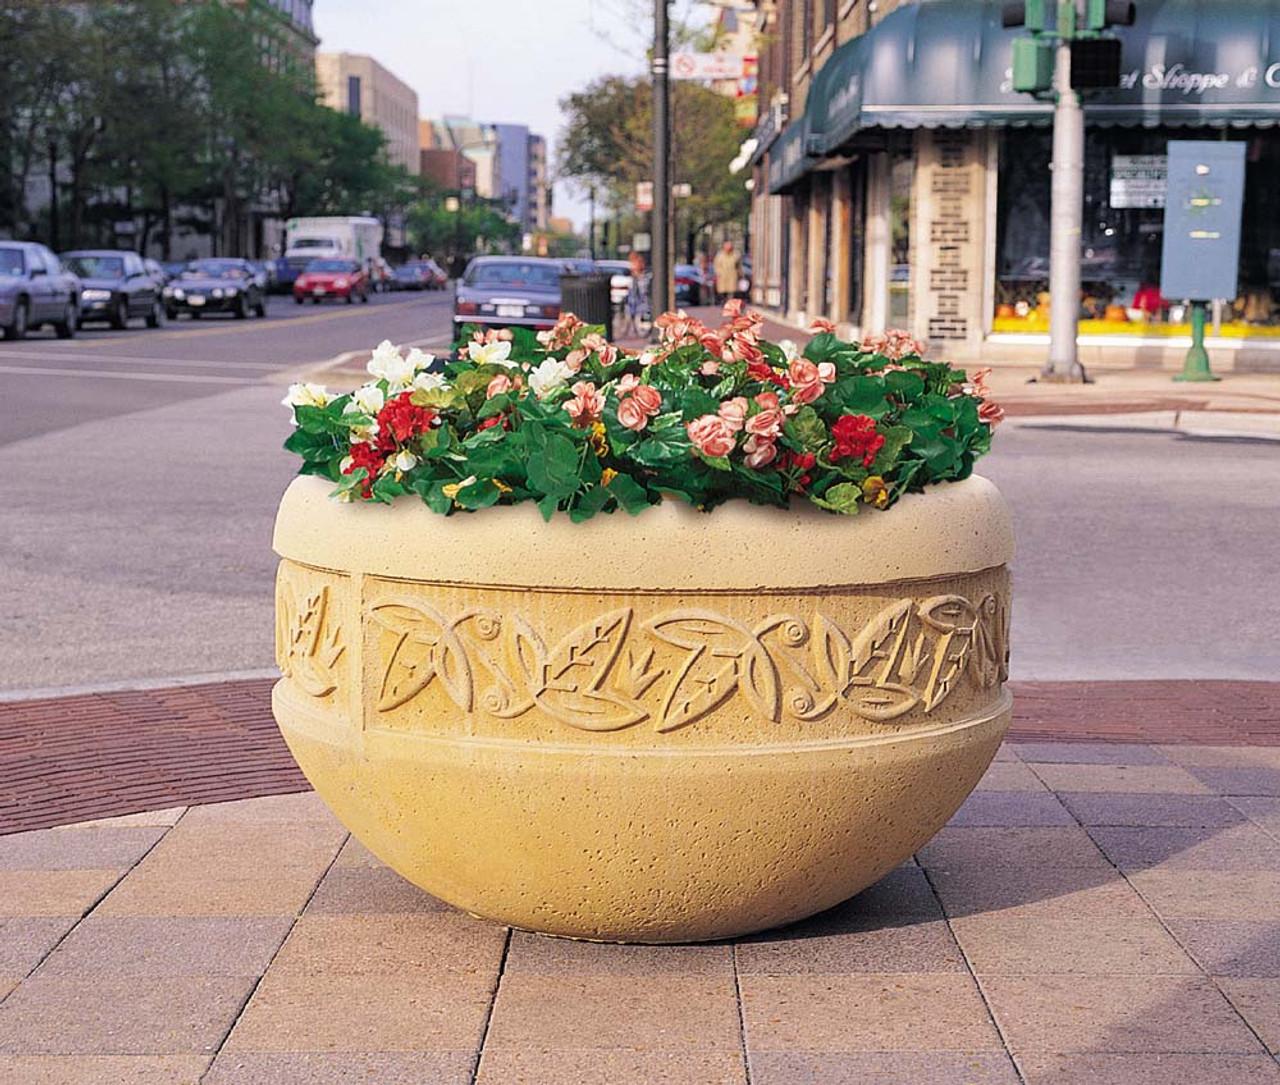 Decorative Round Outdoor Concrete Planter TF4220 on Street